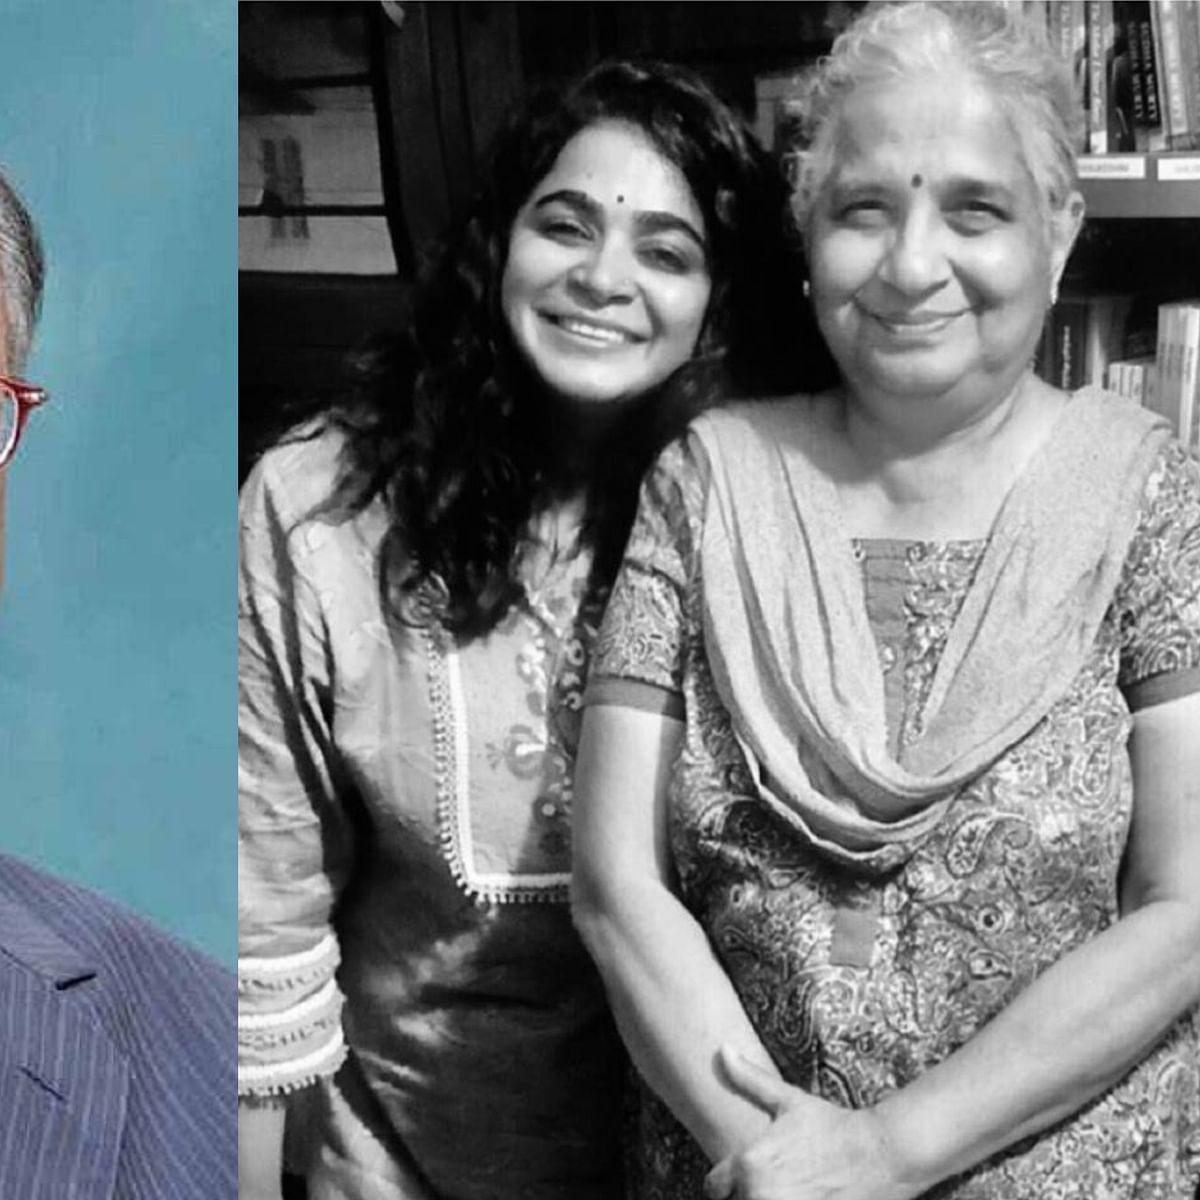 Ashwiny Iyer Tiwari announces her next film on Narayana and Sudha Murthy